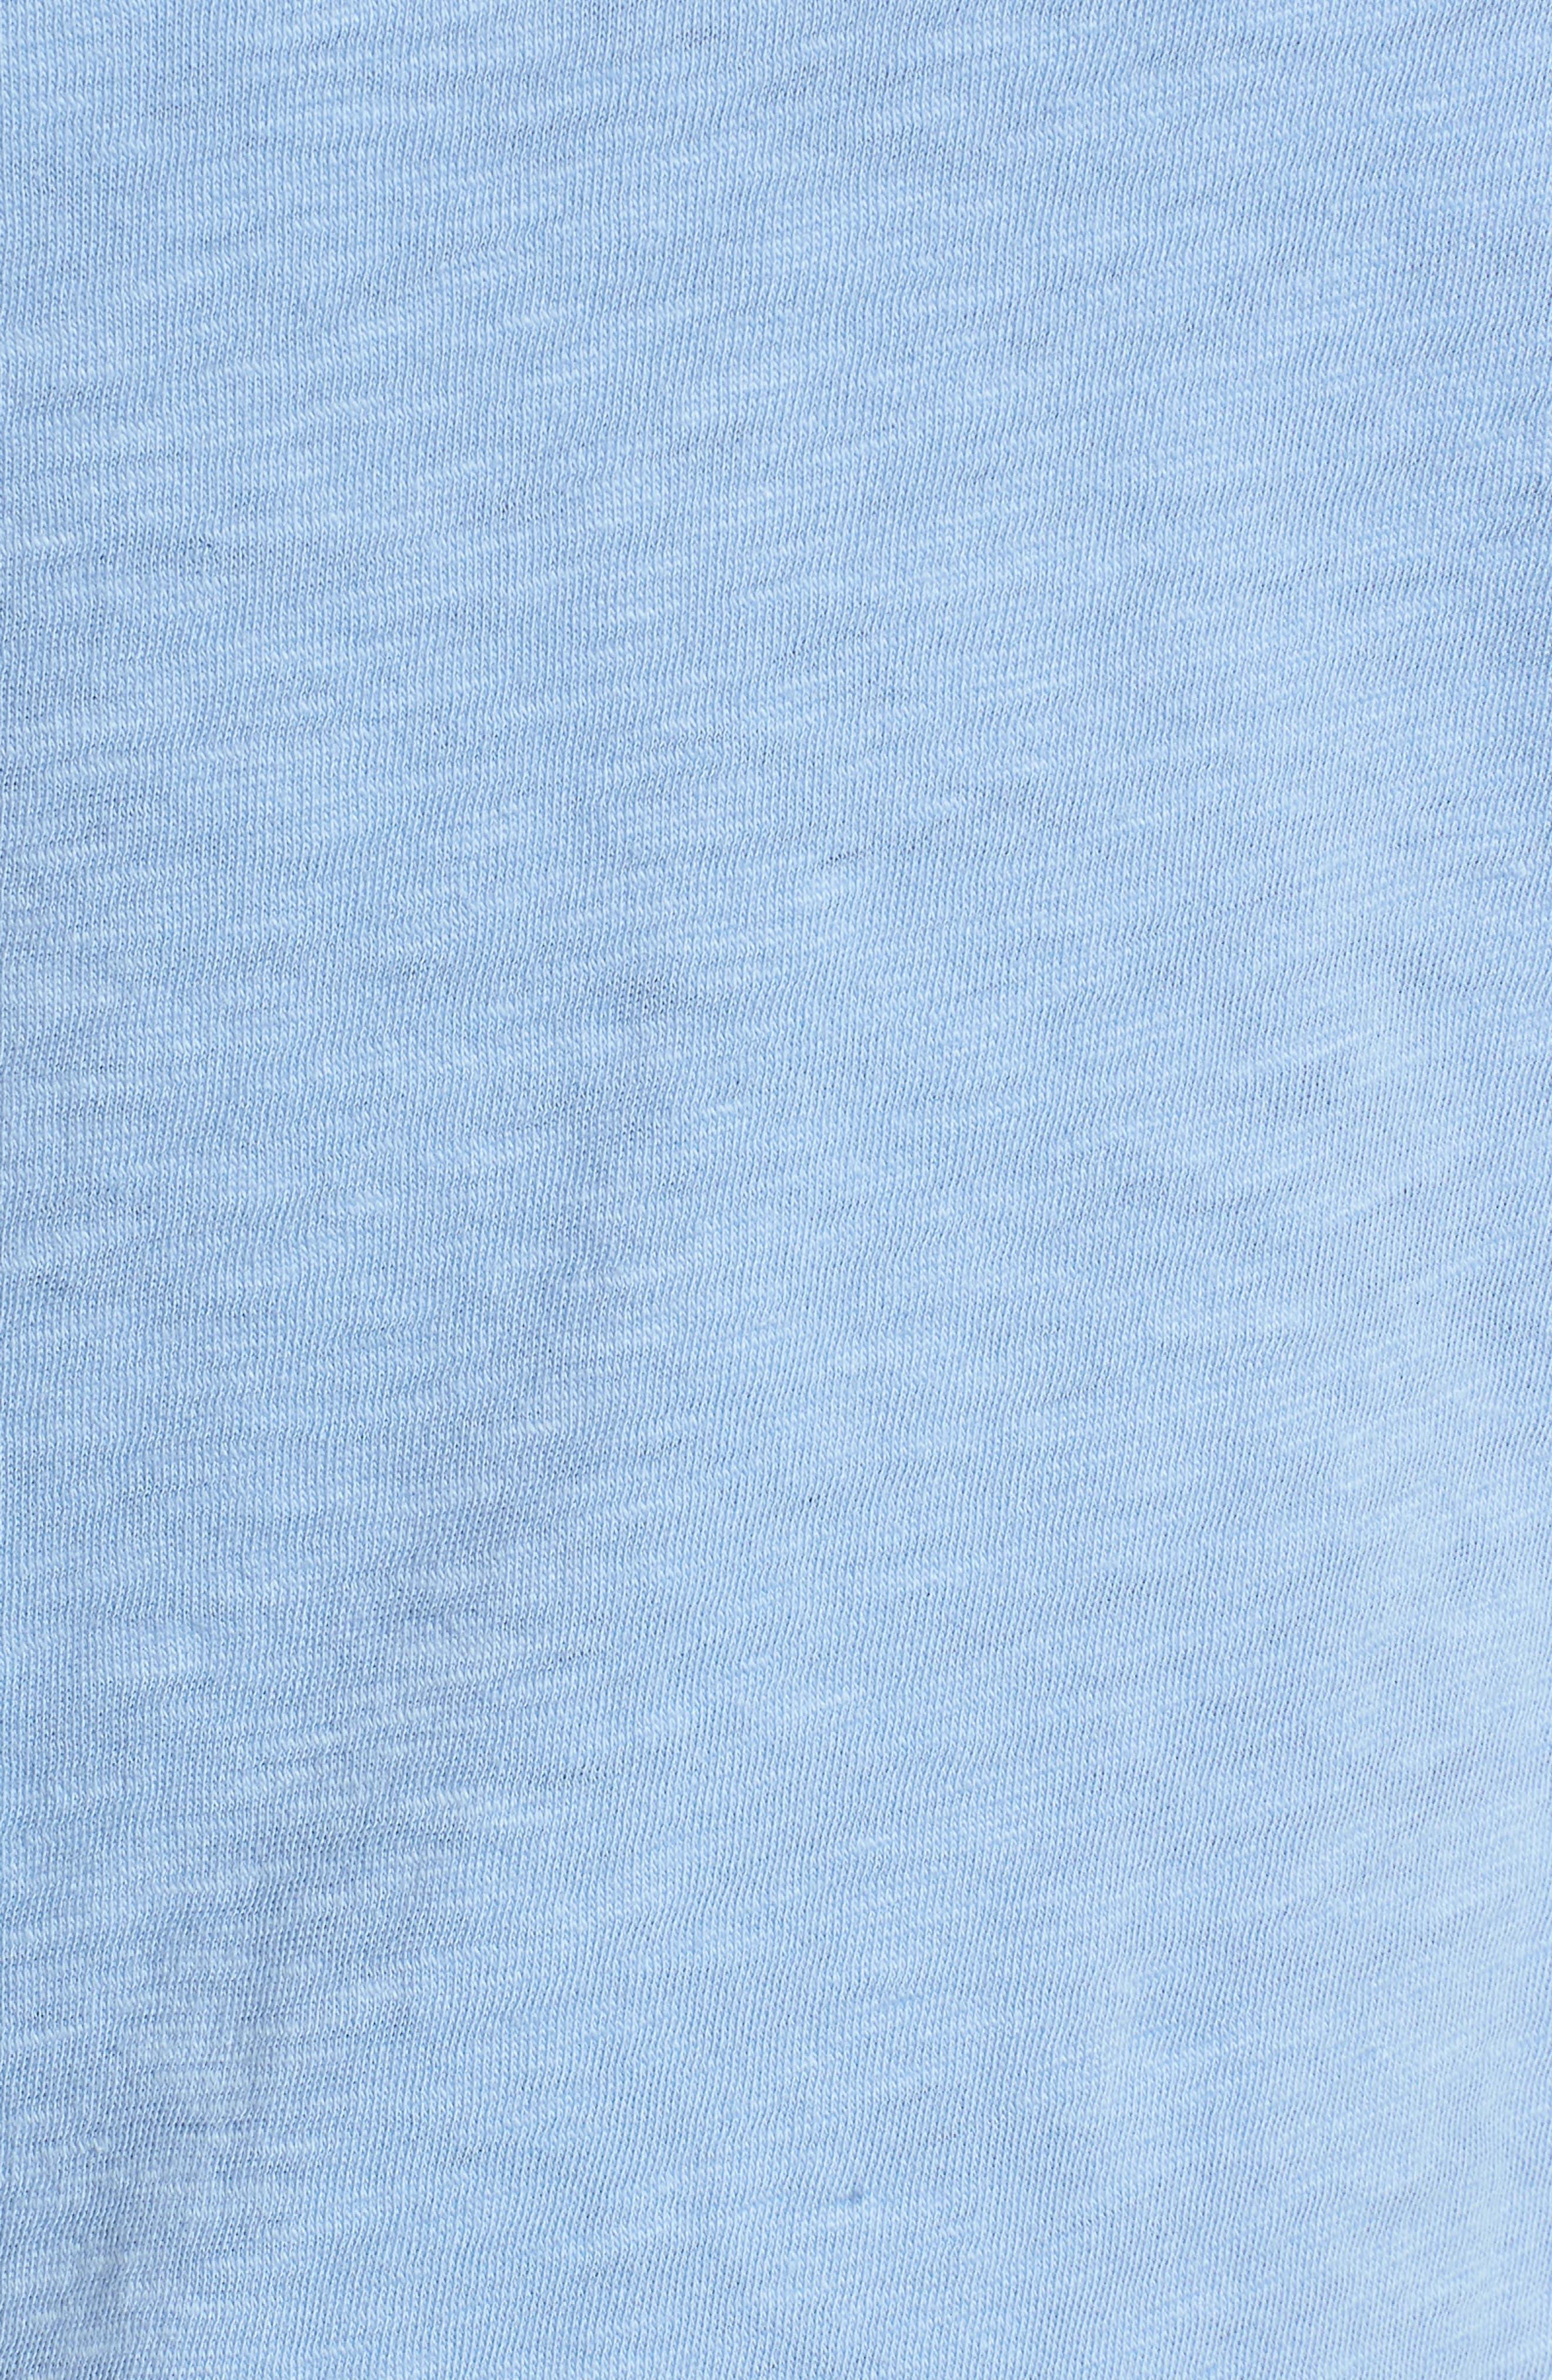 Pleat Sleeve Cotton Tee,                             Alternate thumbnail 24, color,